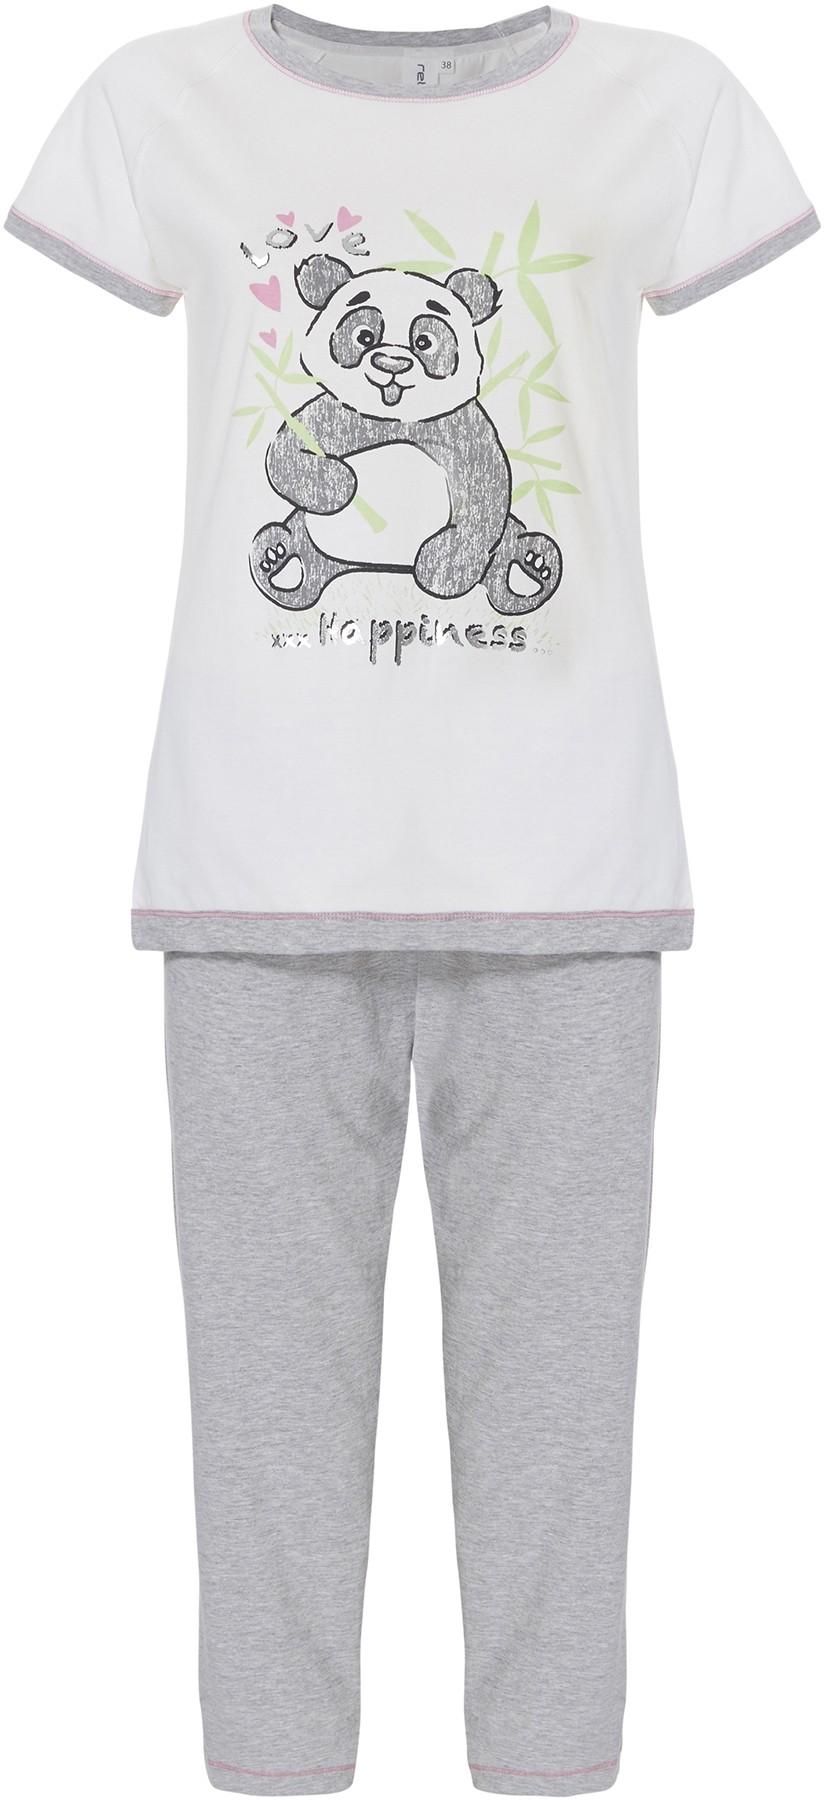 Image of Dames Pyjama Rebelle 2181-230-2-38